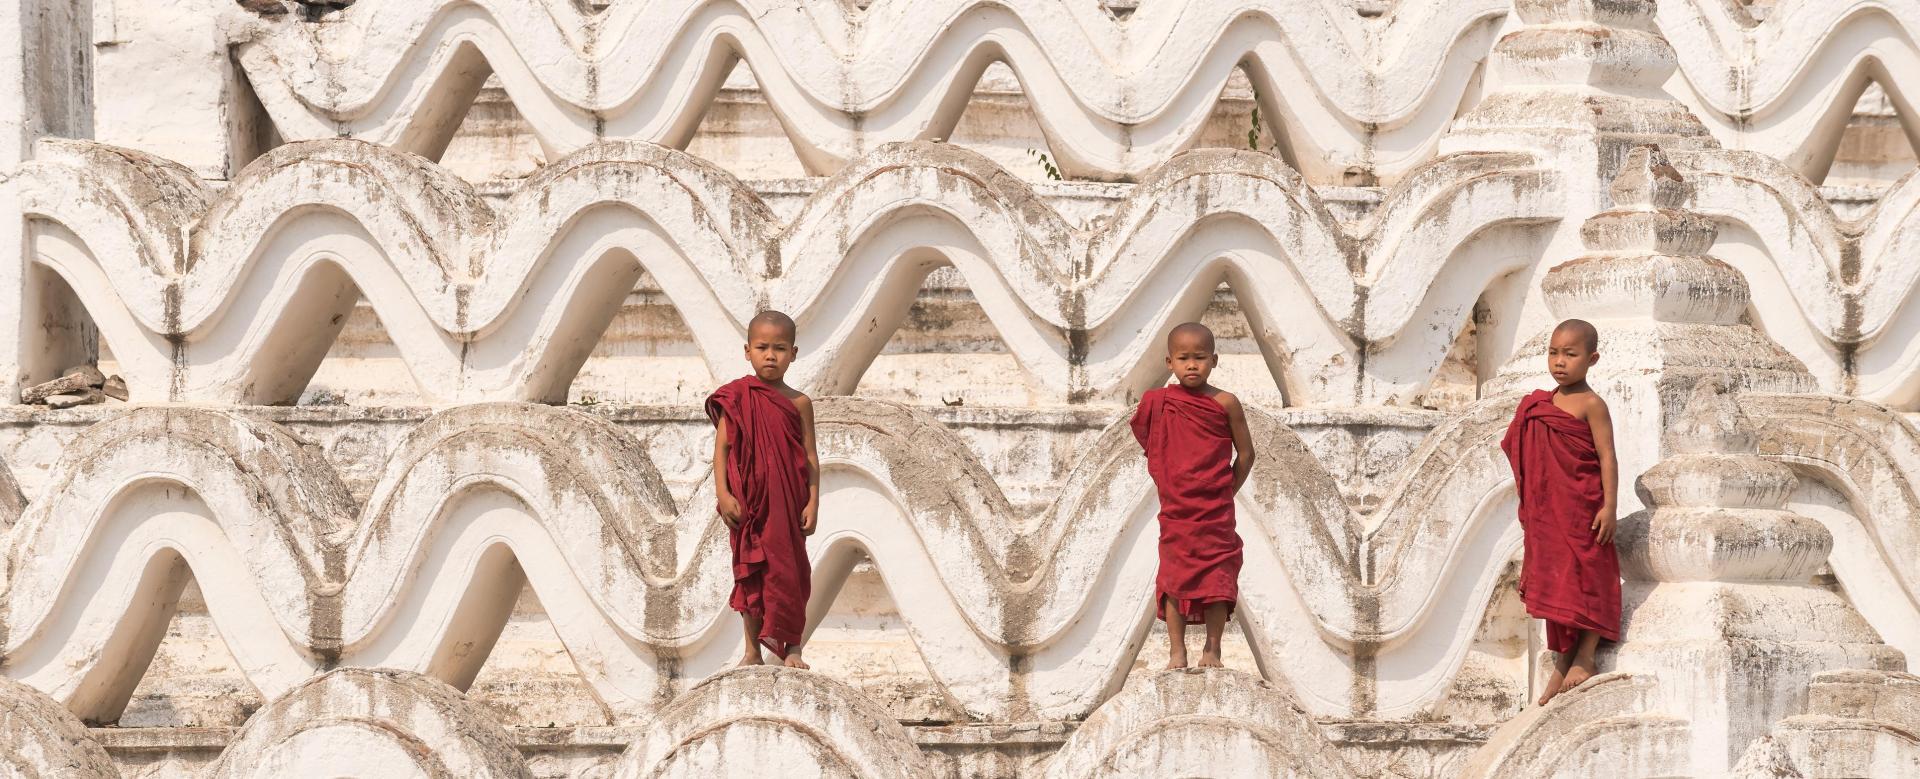 Voyage à pied Birmanie : Les ors de birmanie